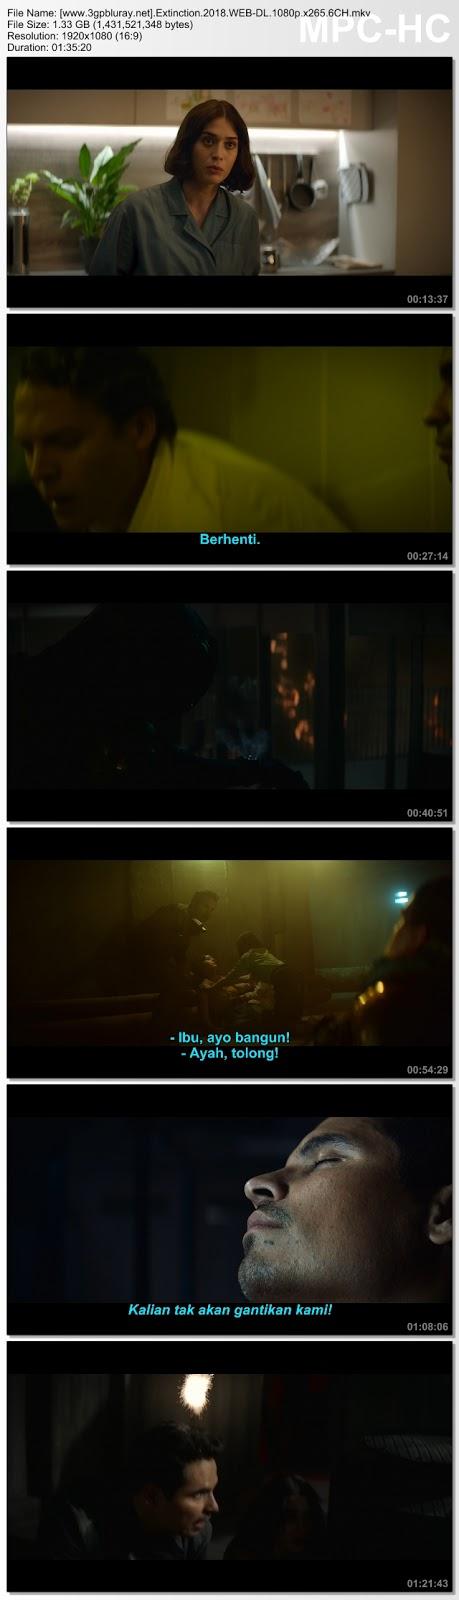 Screenshots Download Film Gratis Hardsub Indo Extinction (2018) WEB-DL 480p MP4 Subtitle Bahasa Indonesia 3GP